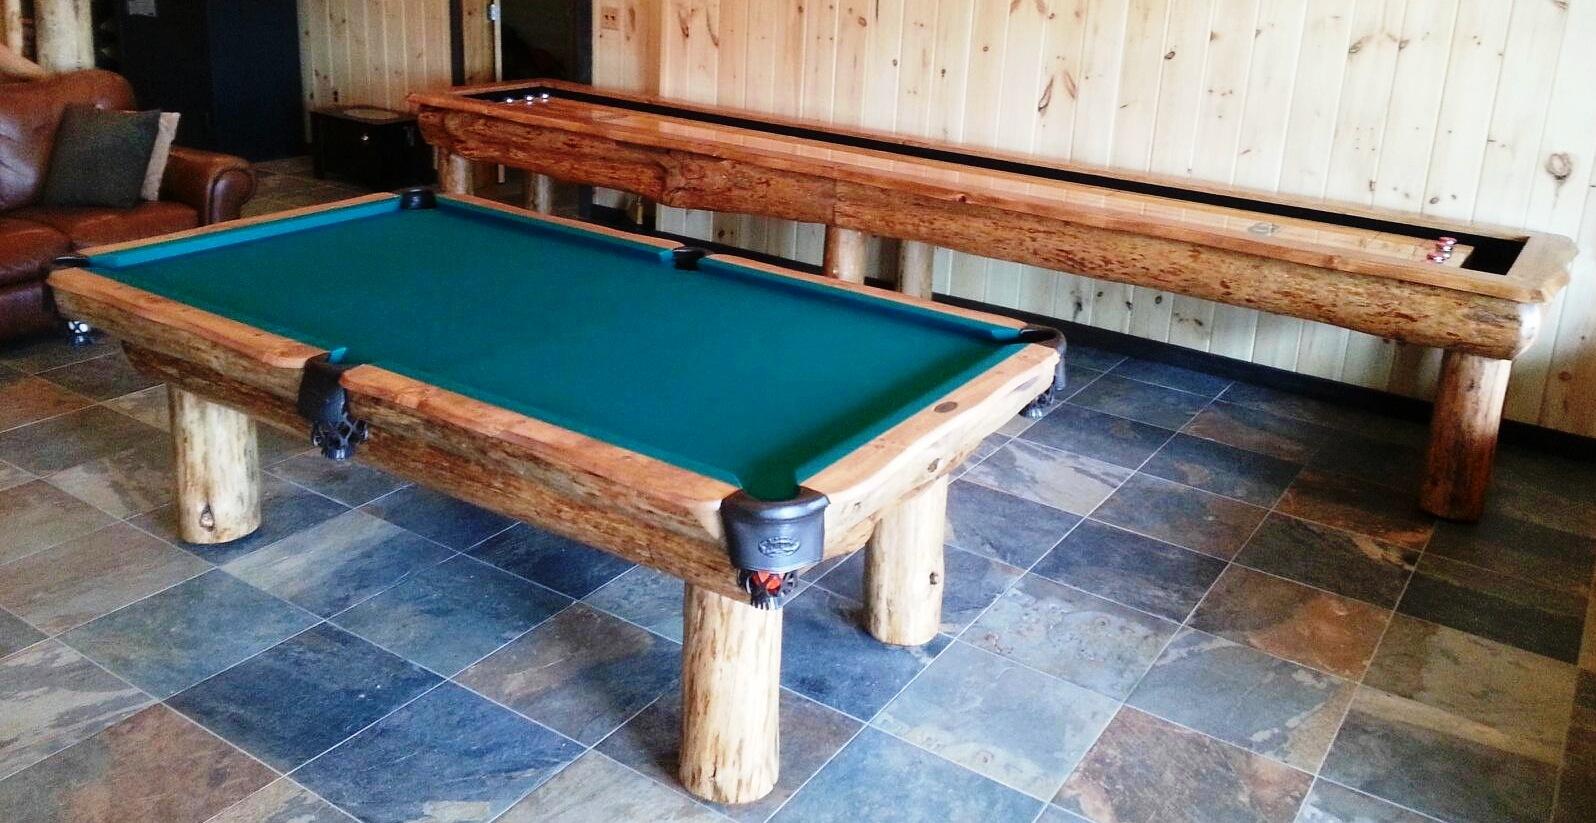 Ponderosa Pool Table Shuffle Combo Royal Billiard Recreation - Ponderosa pool table